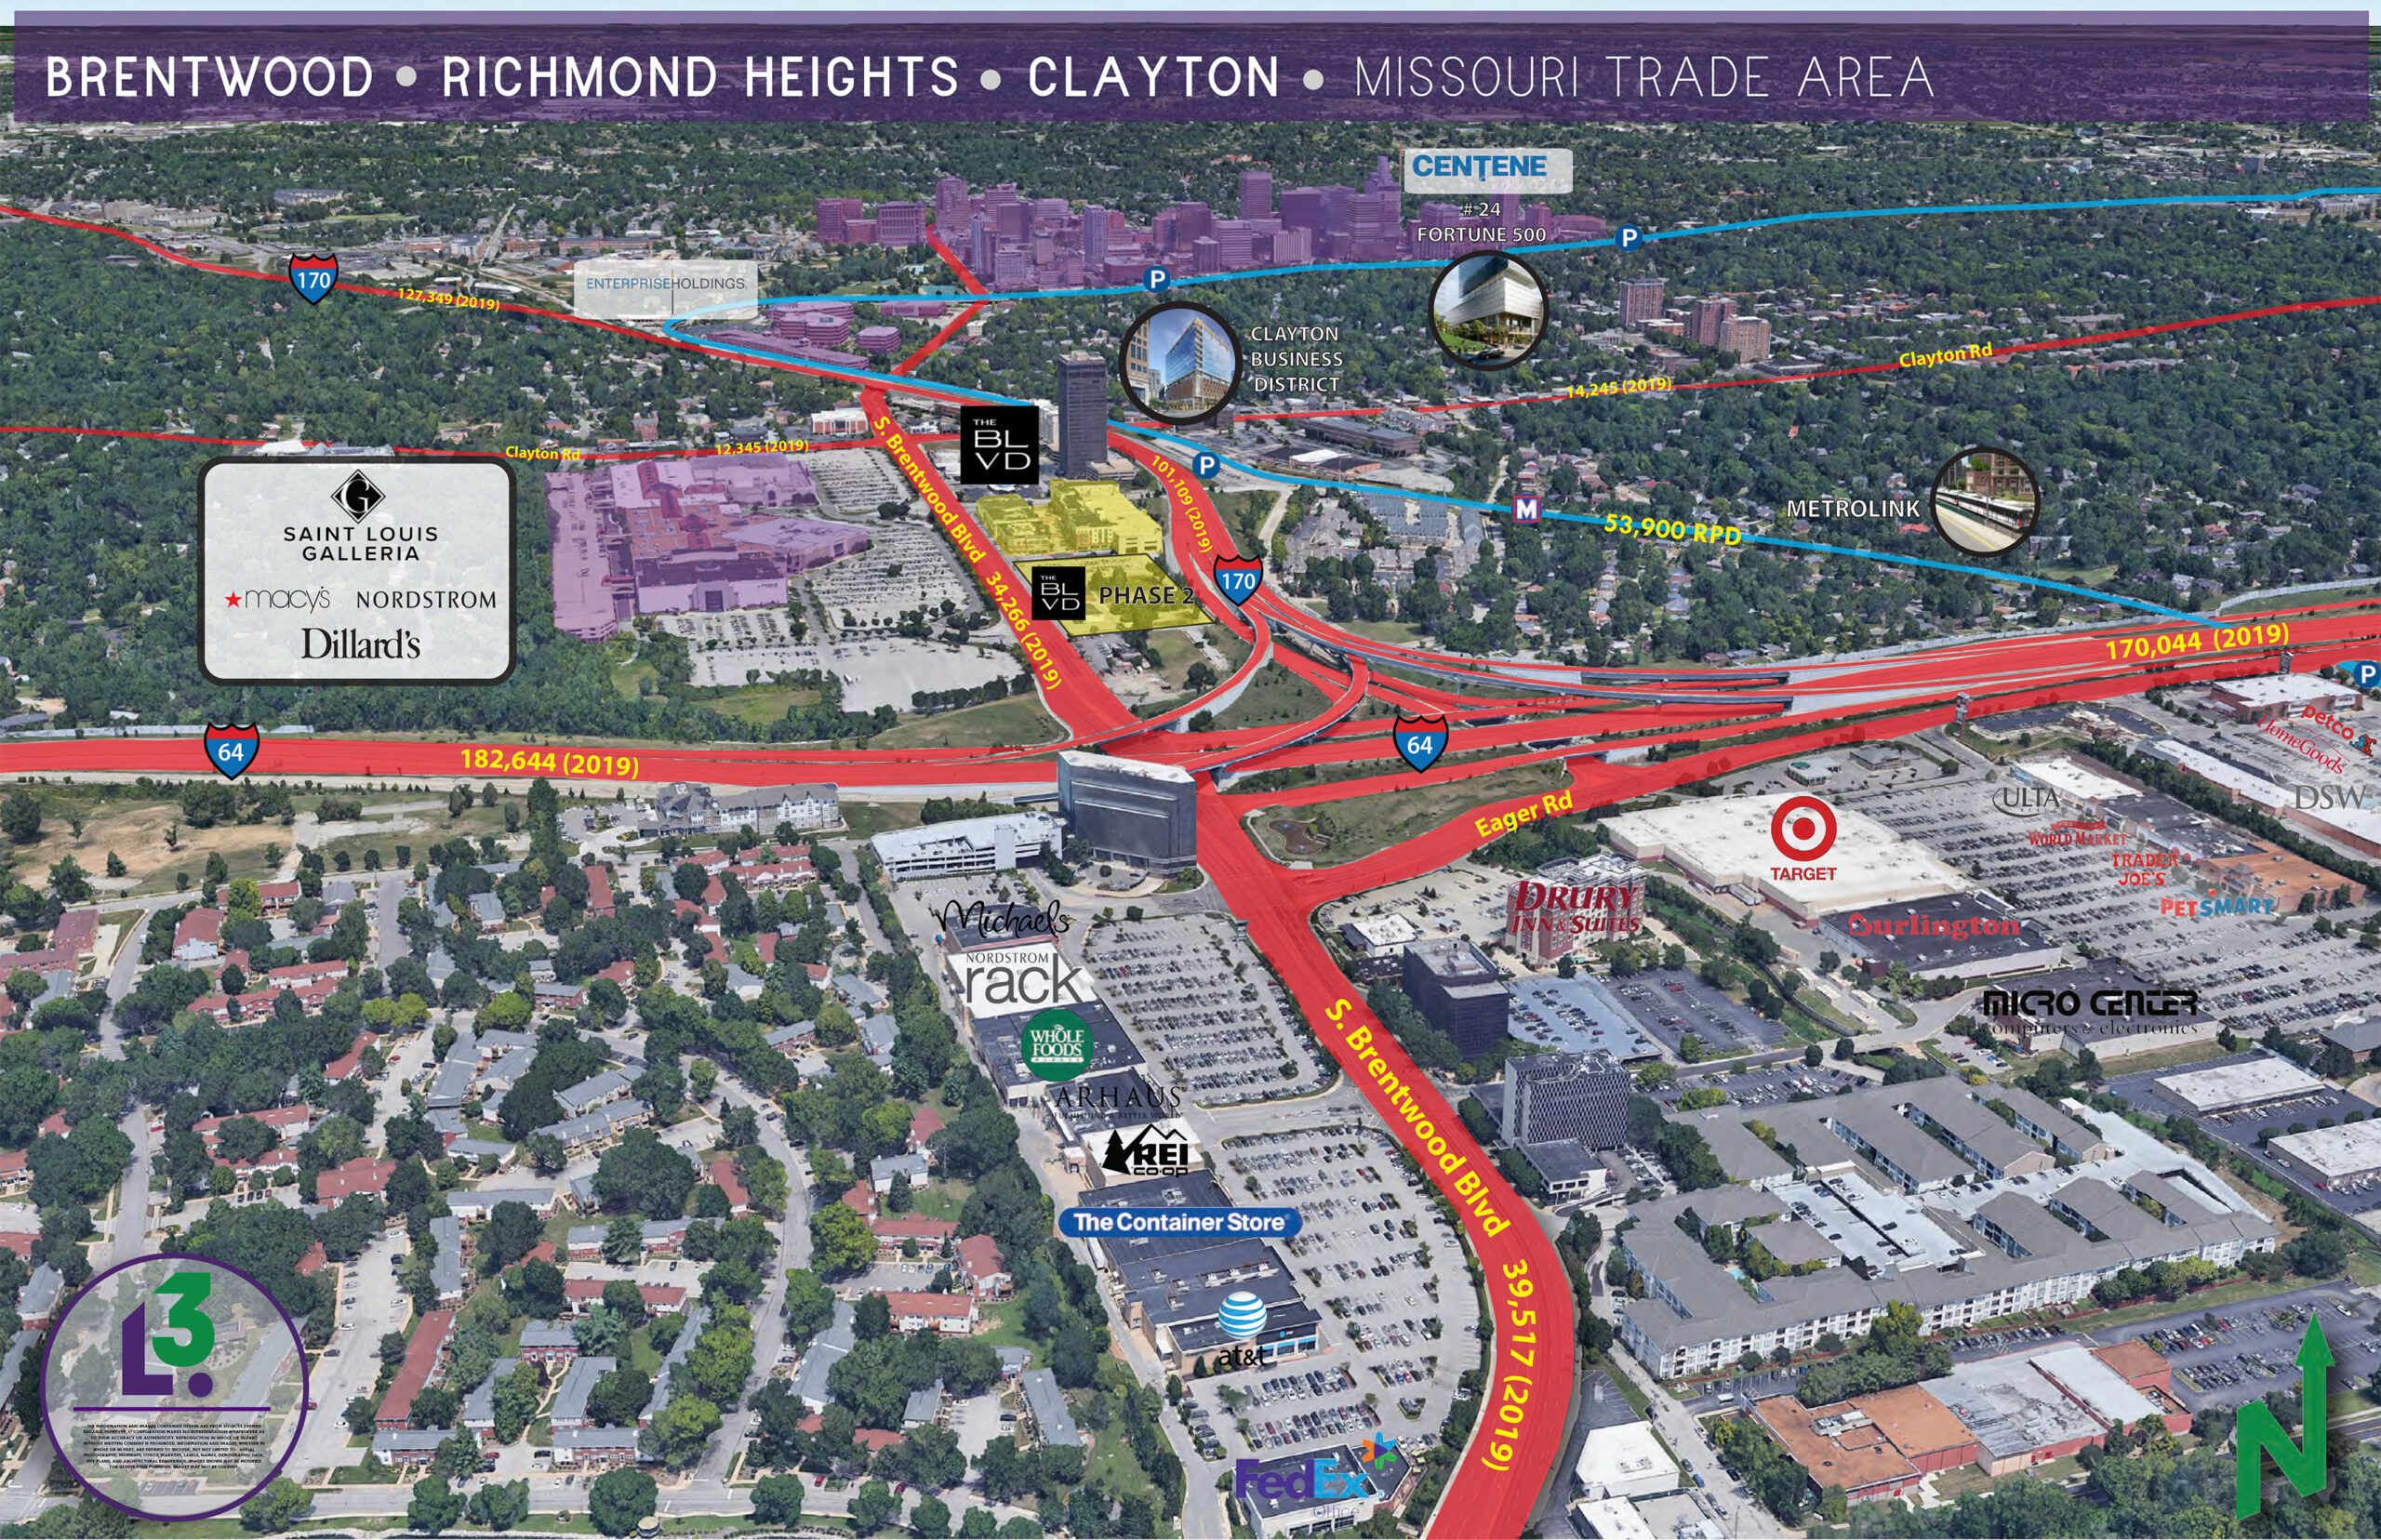 Richmond Heights Aerial